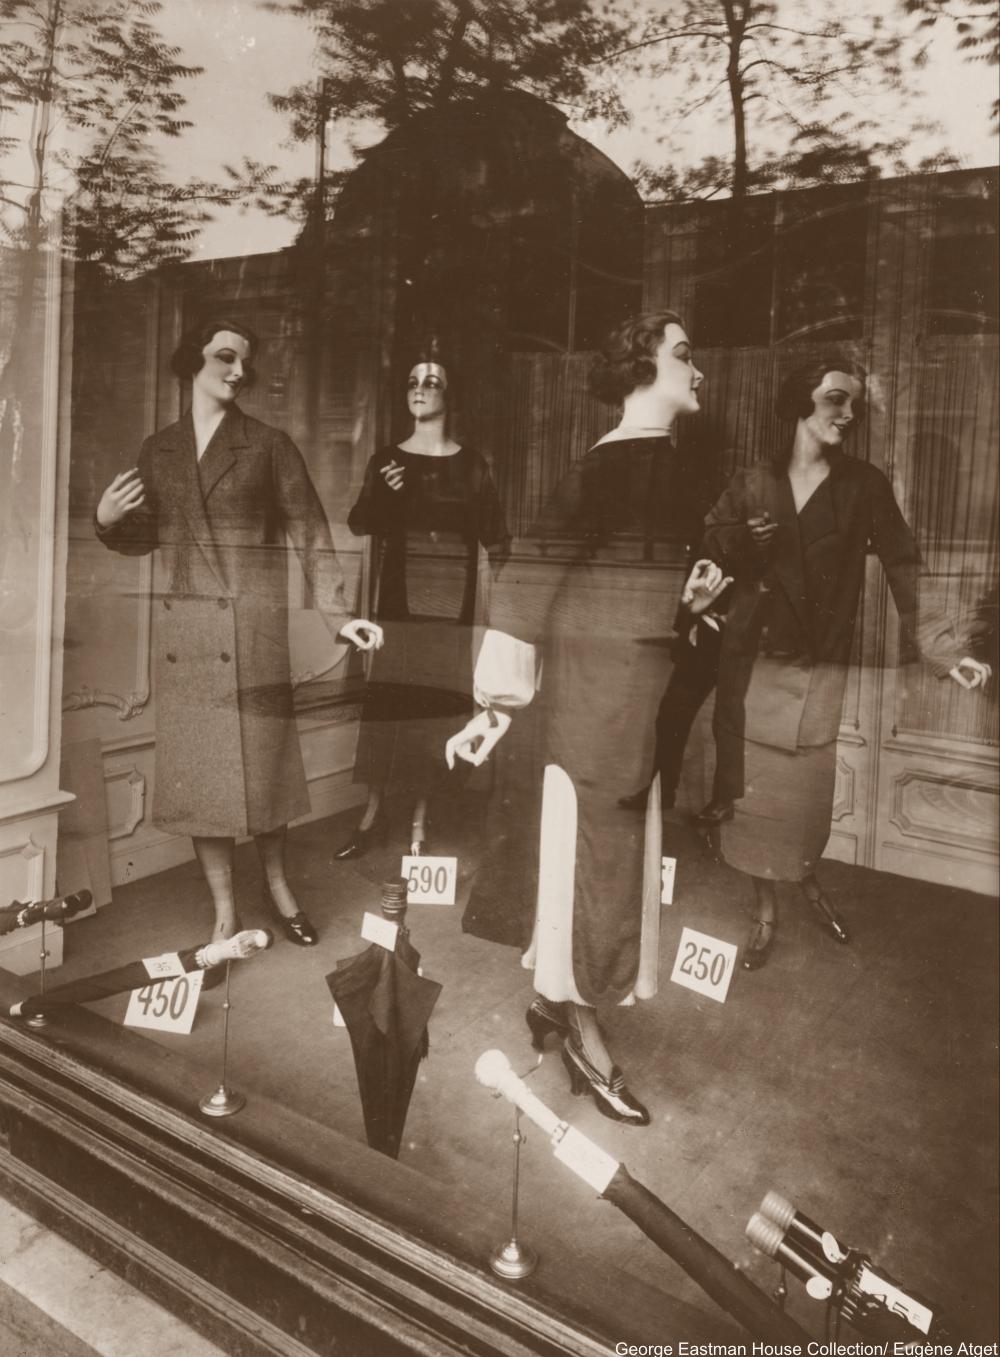 avenue des Gobelins 1926 by Eugène Atget